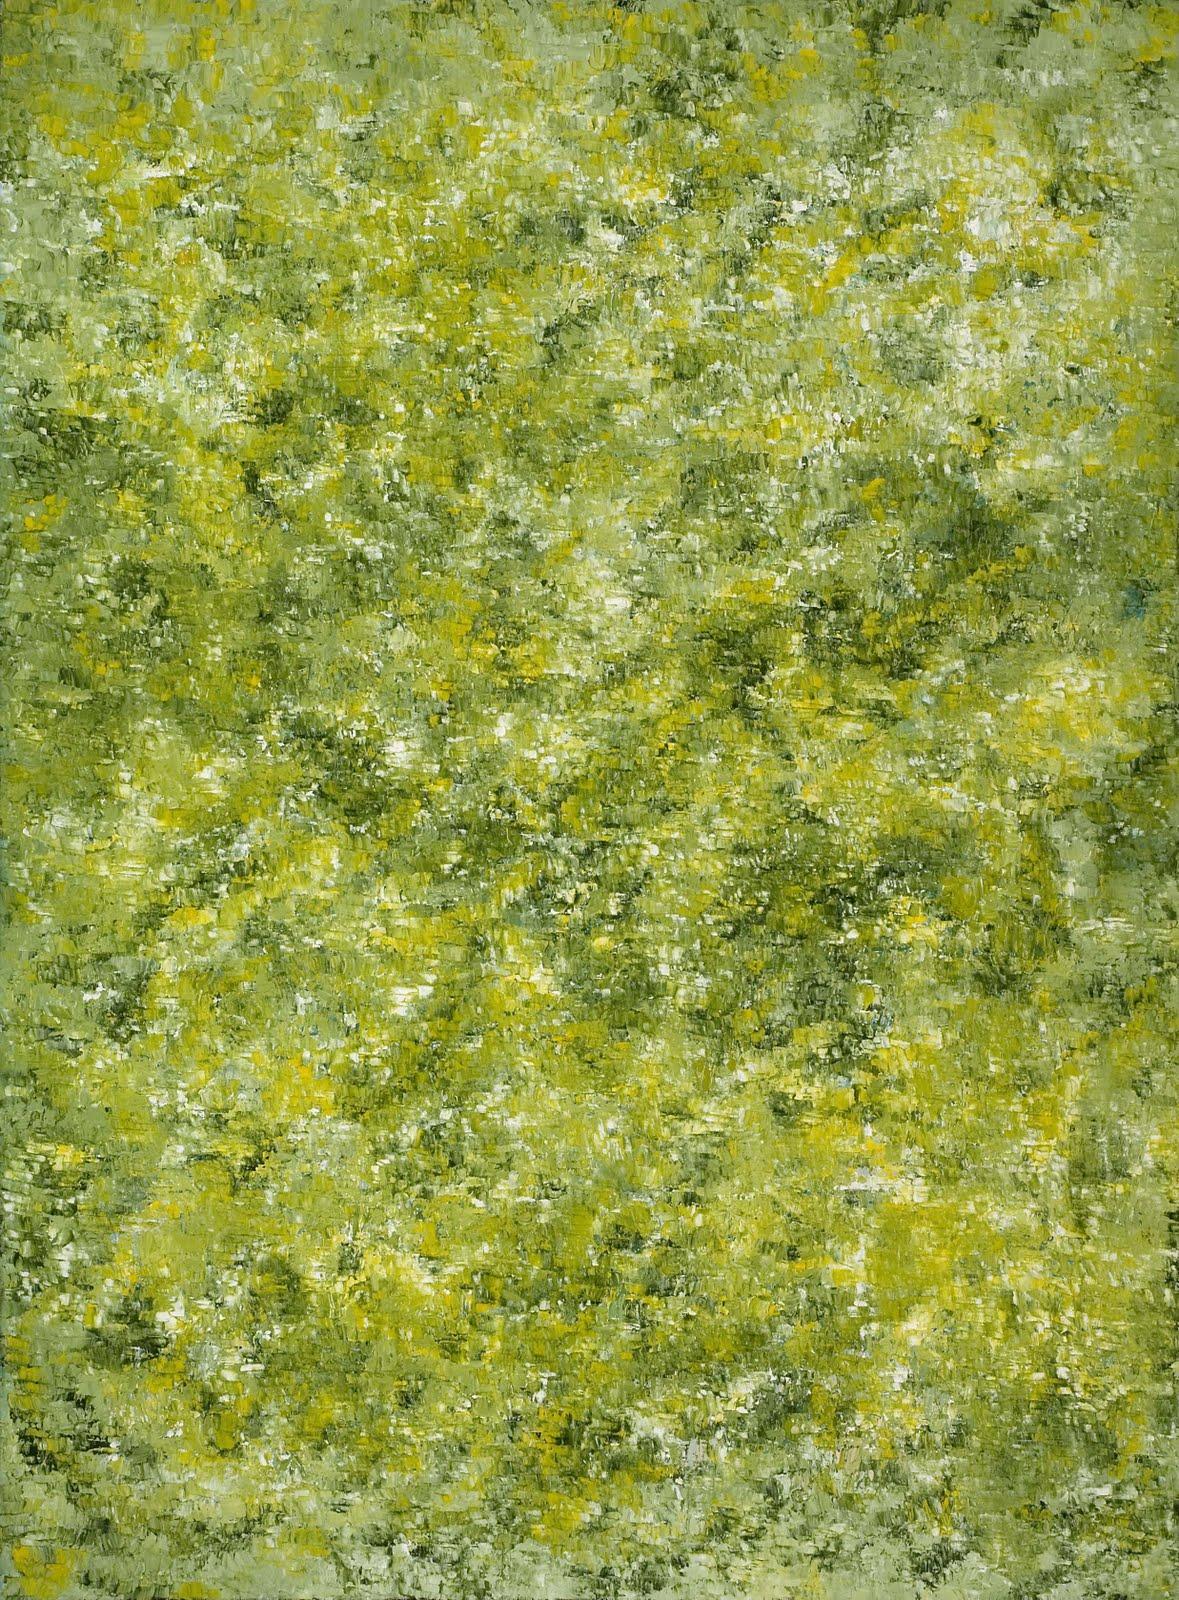 Mossy Moss